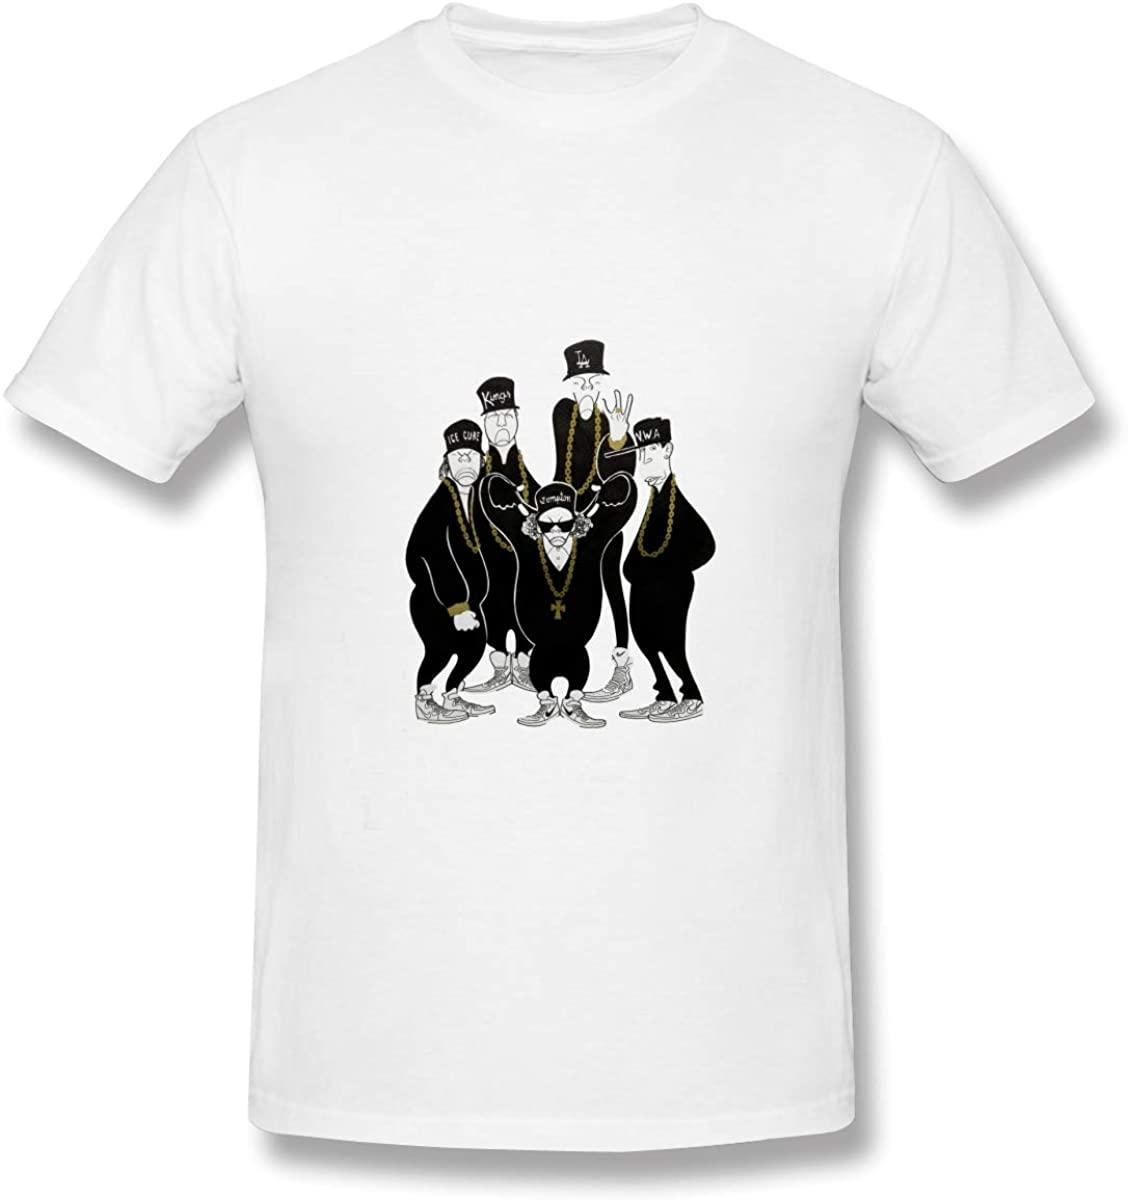 Hbokink NWA Mens Athletic Mens Cotton Short Sleeve T-Shirt White